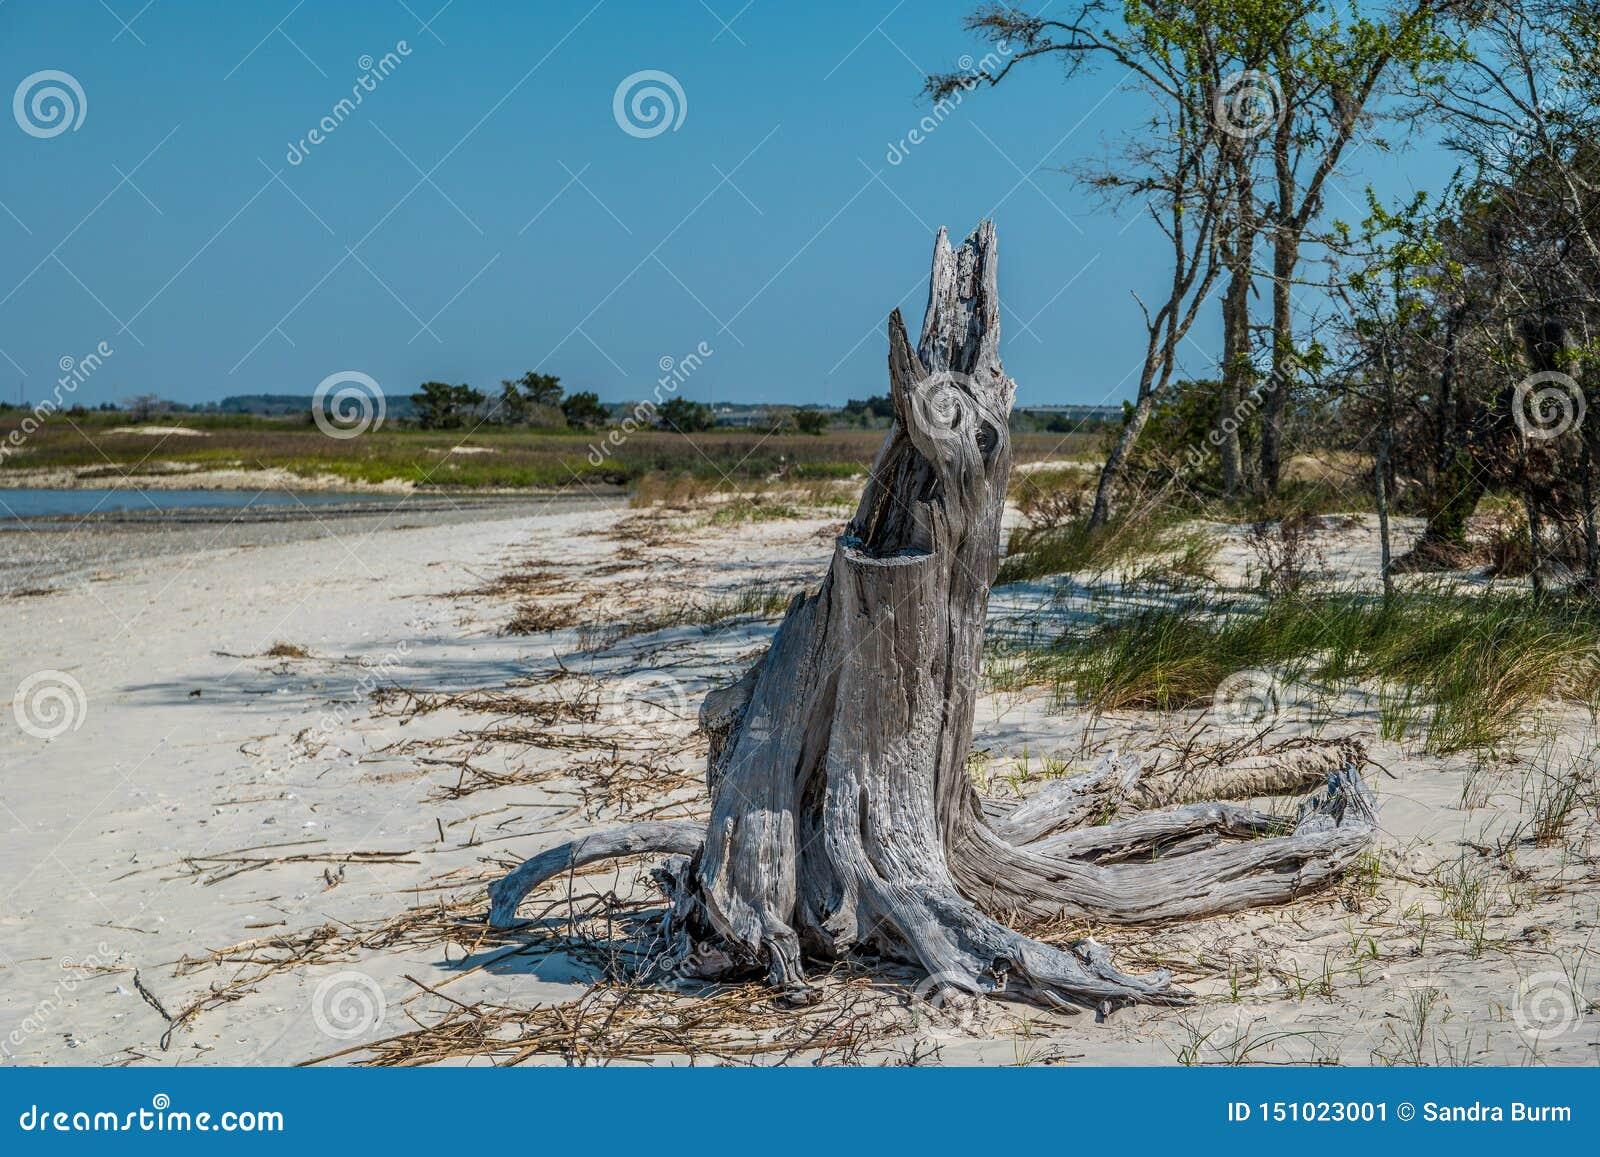 Decayed tree stump on the beach